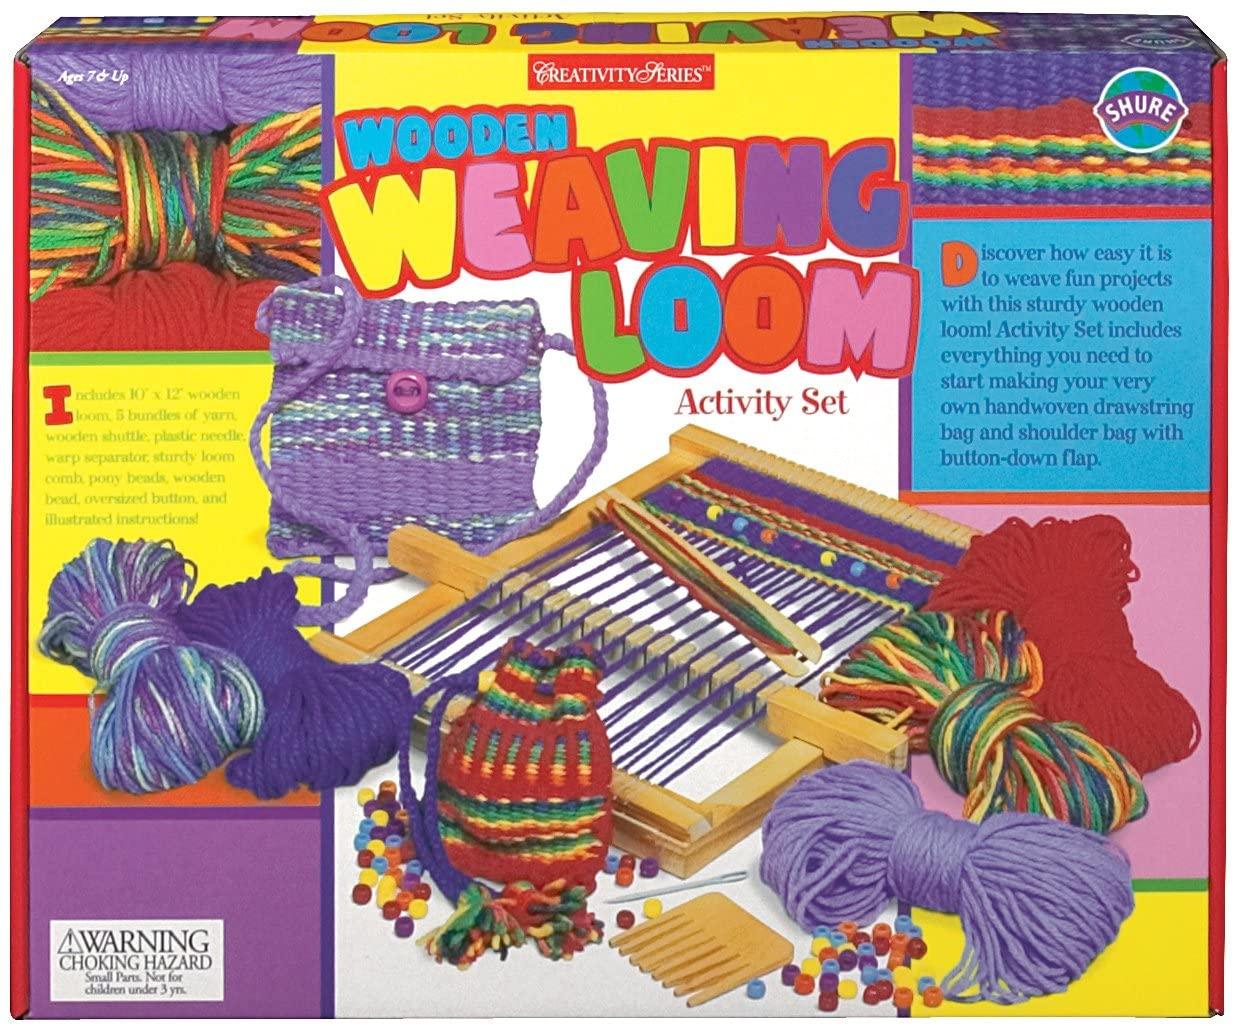 Shure Wooden Weaving Loom